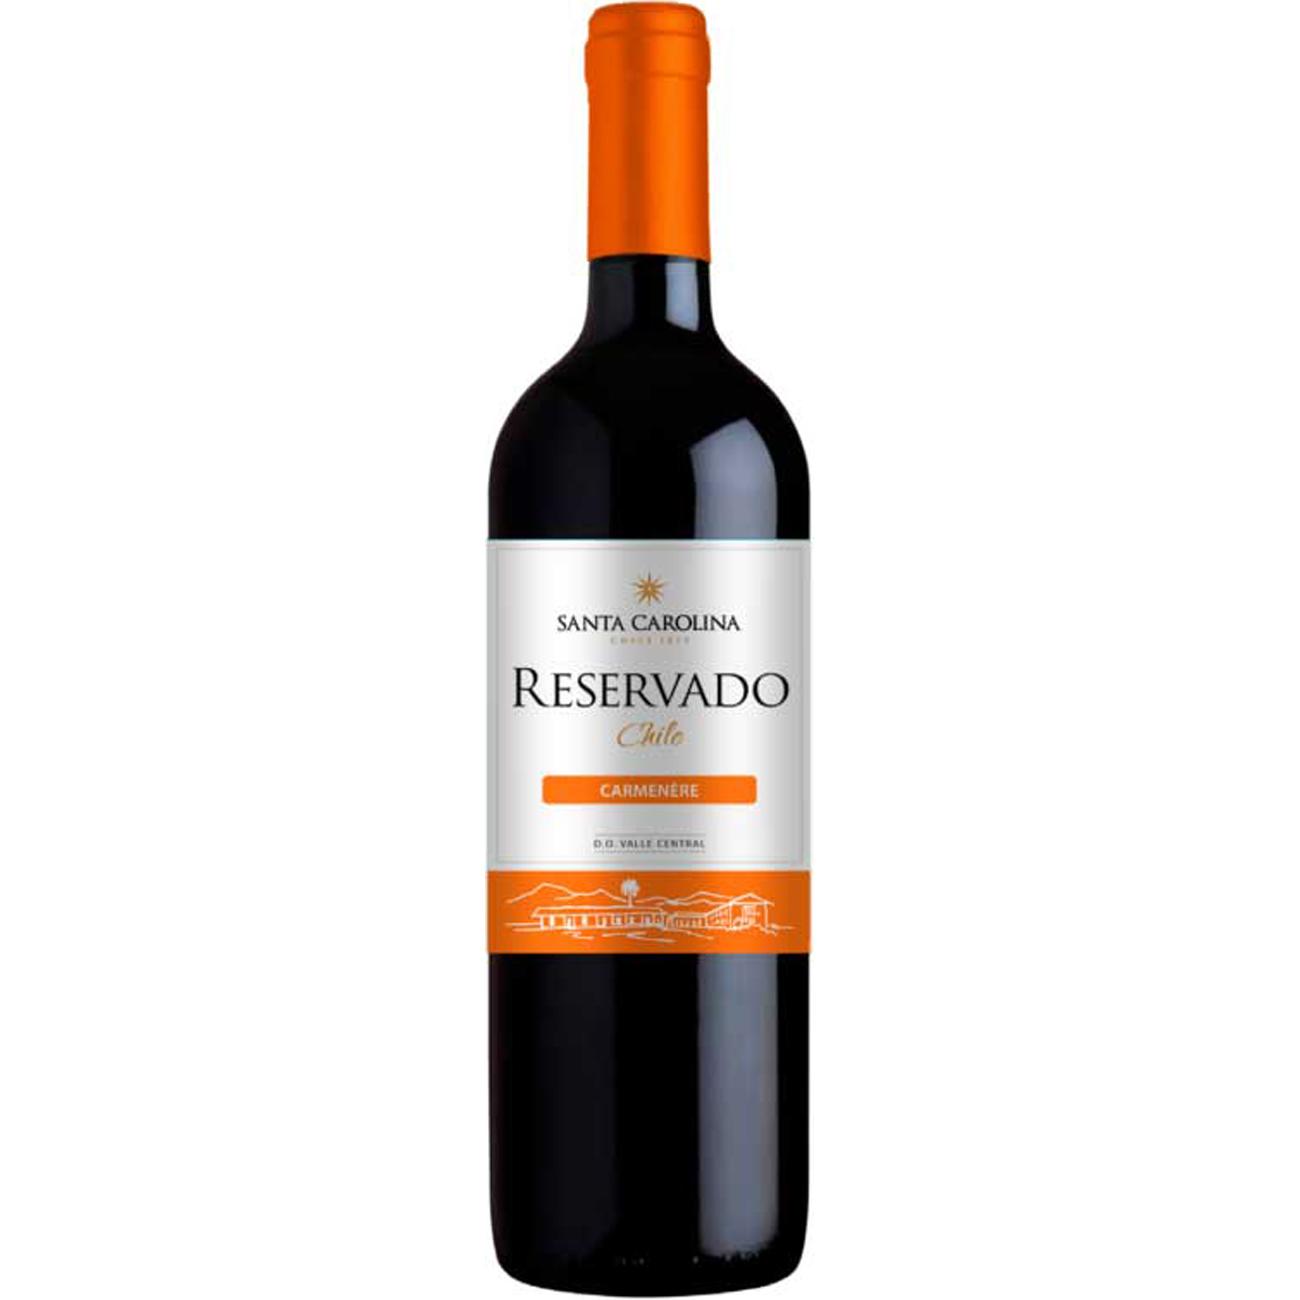 Vinho Santa Carolina Reservado Carmenere Tinto 750ml